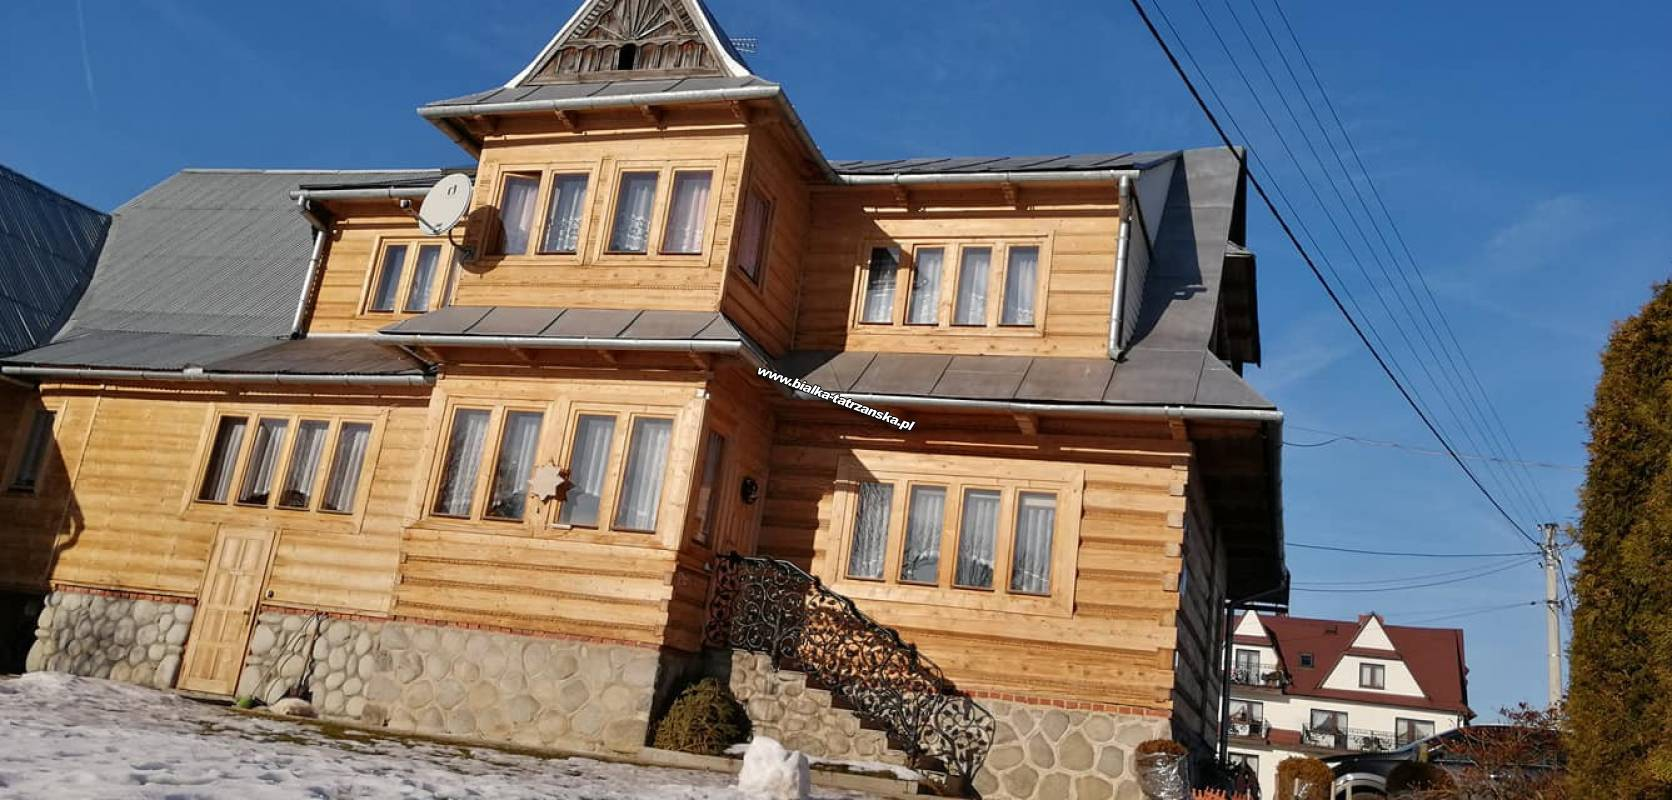 Góralski dom Murzańskich